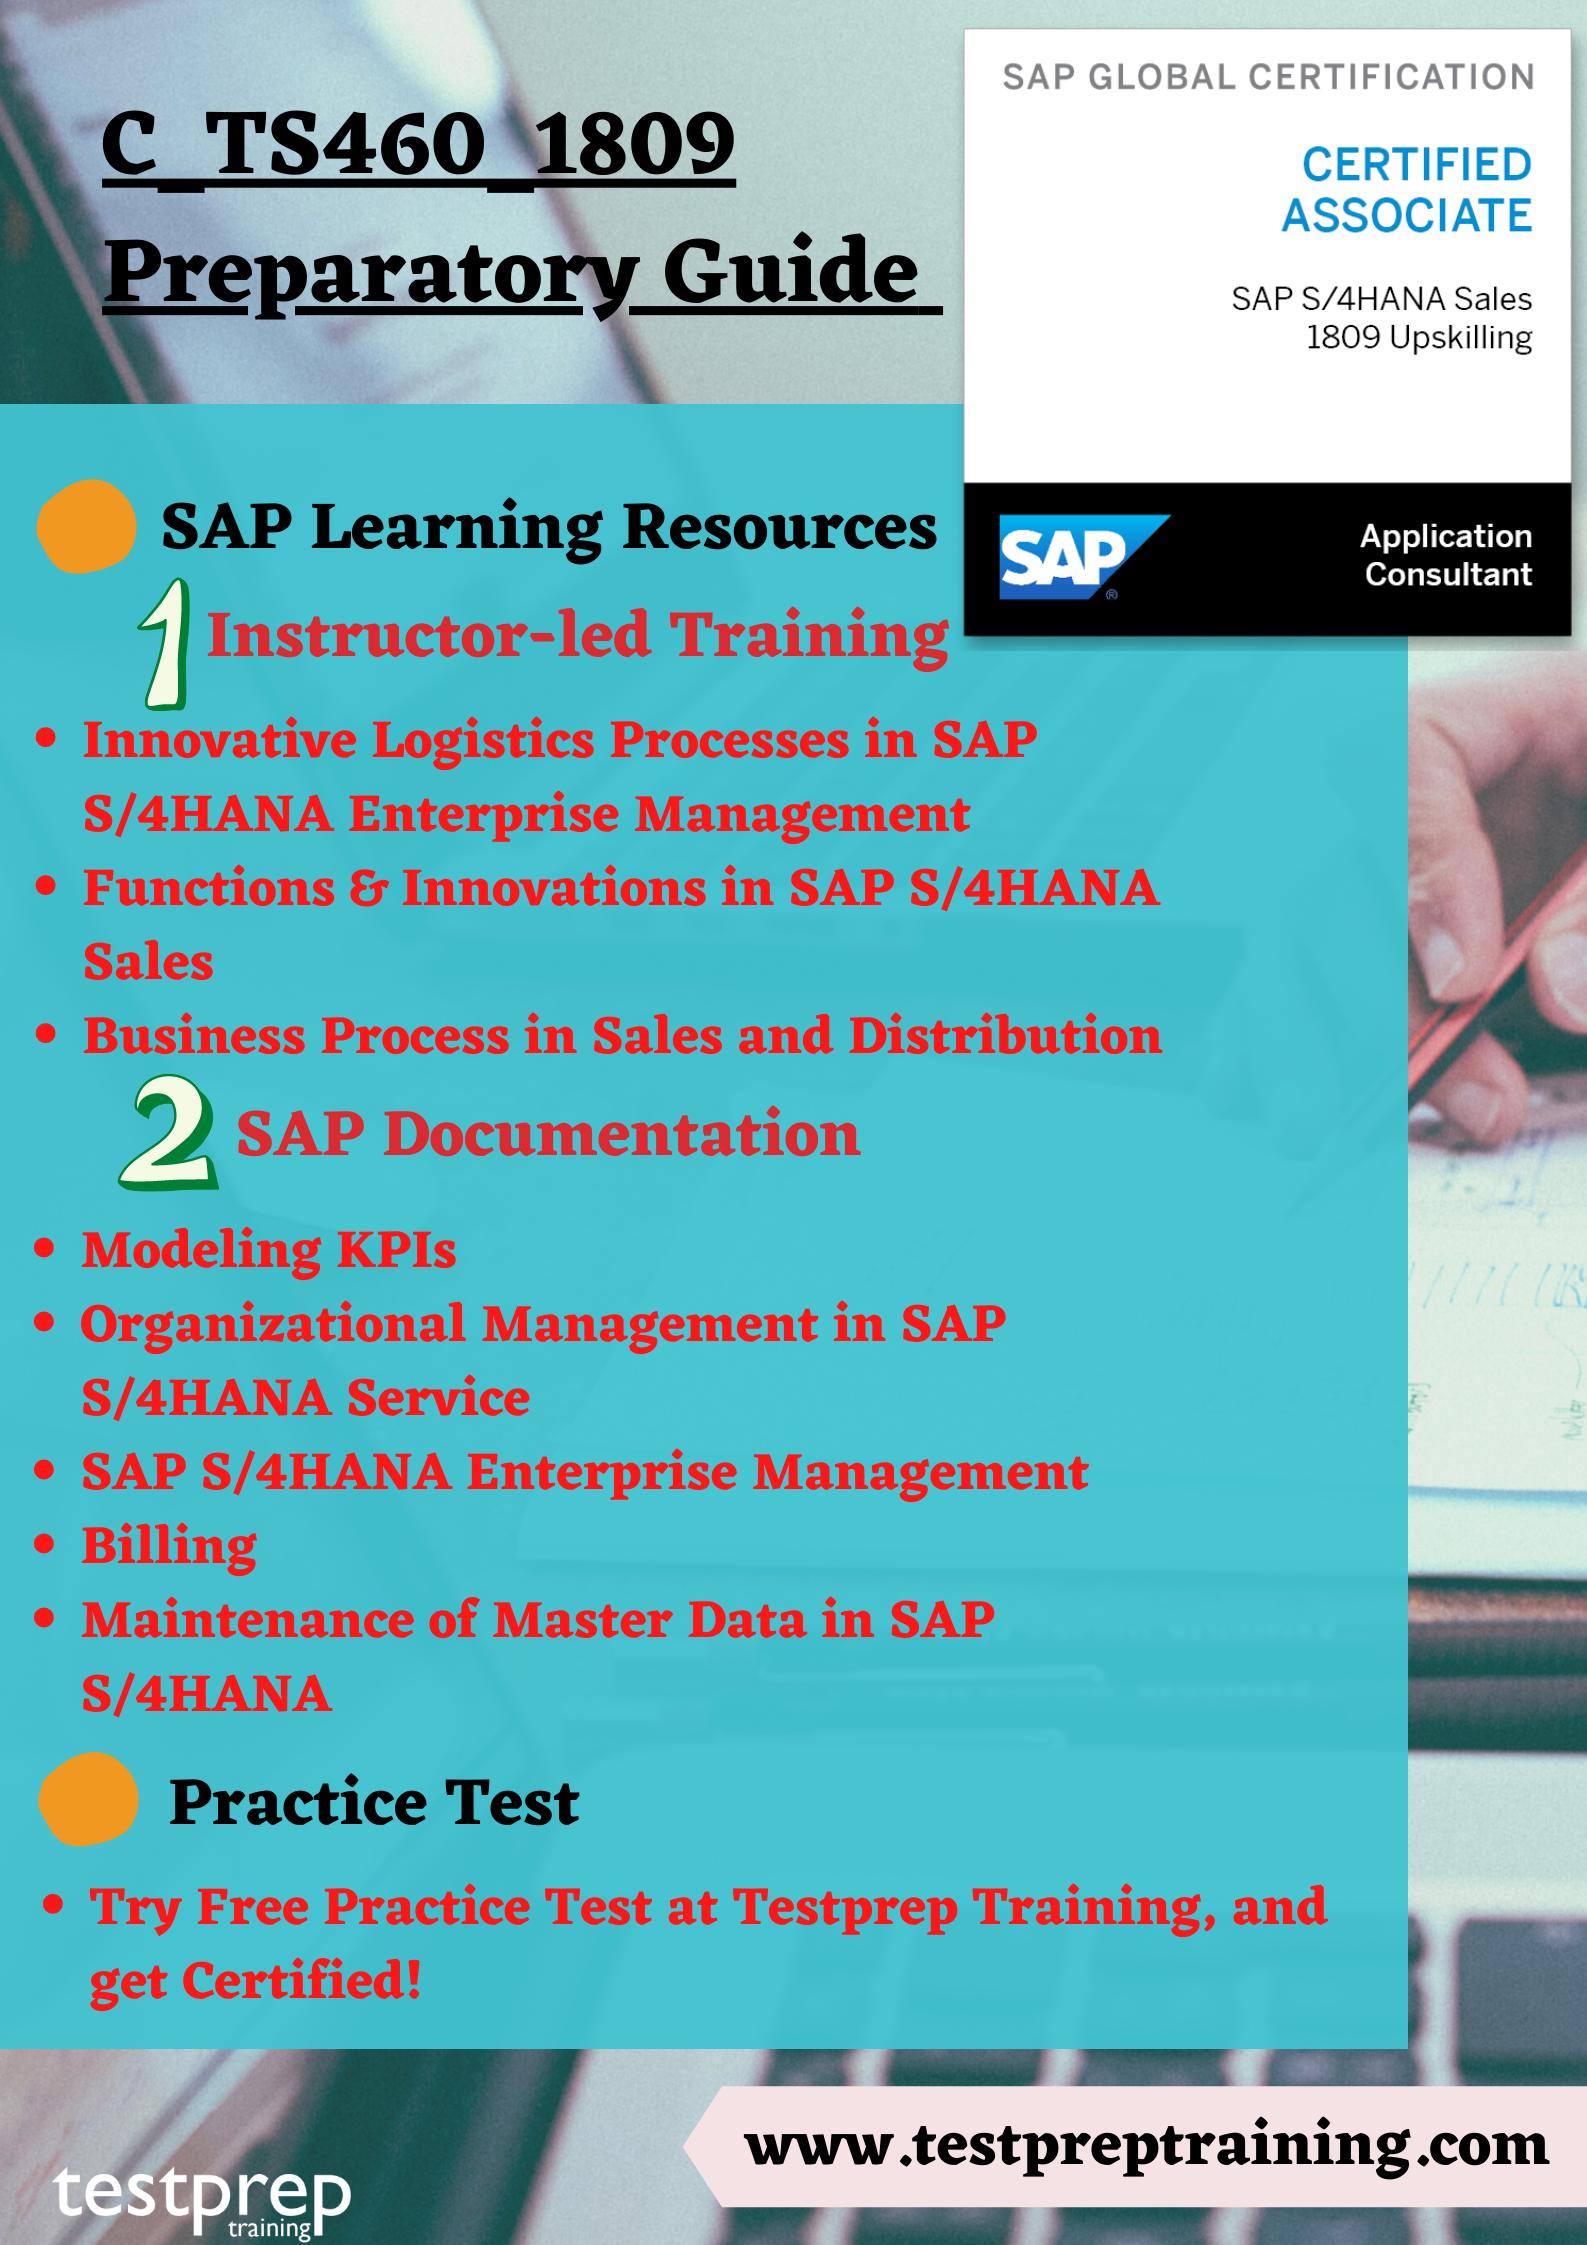 C_TS460_1809 - SAP Certified Application Associate Preparatory guide